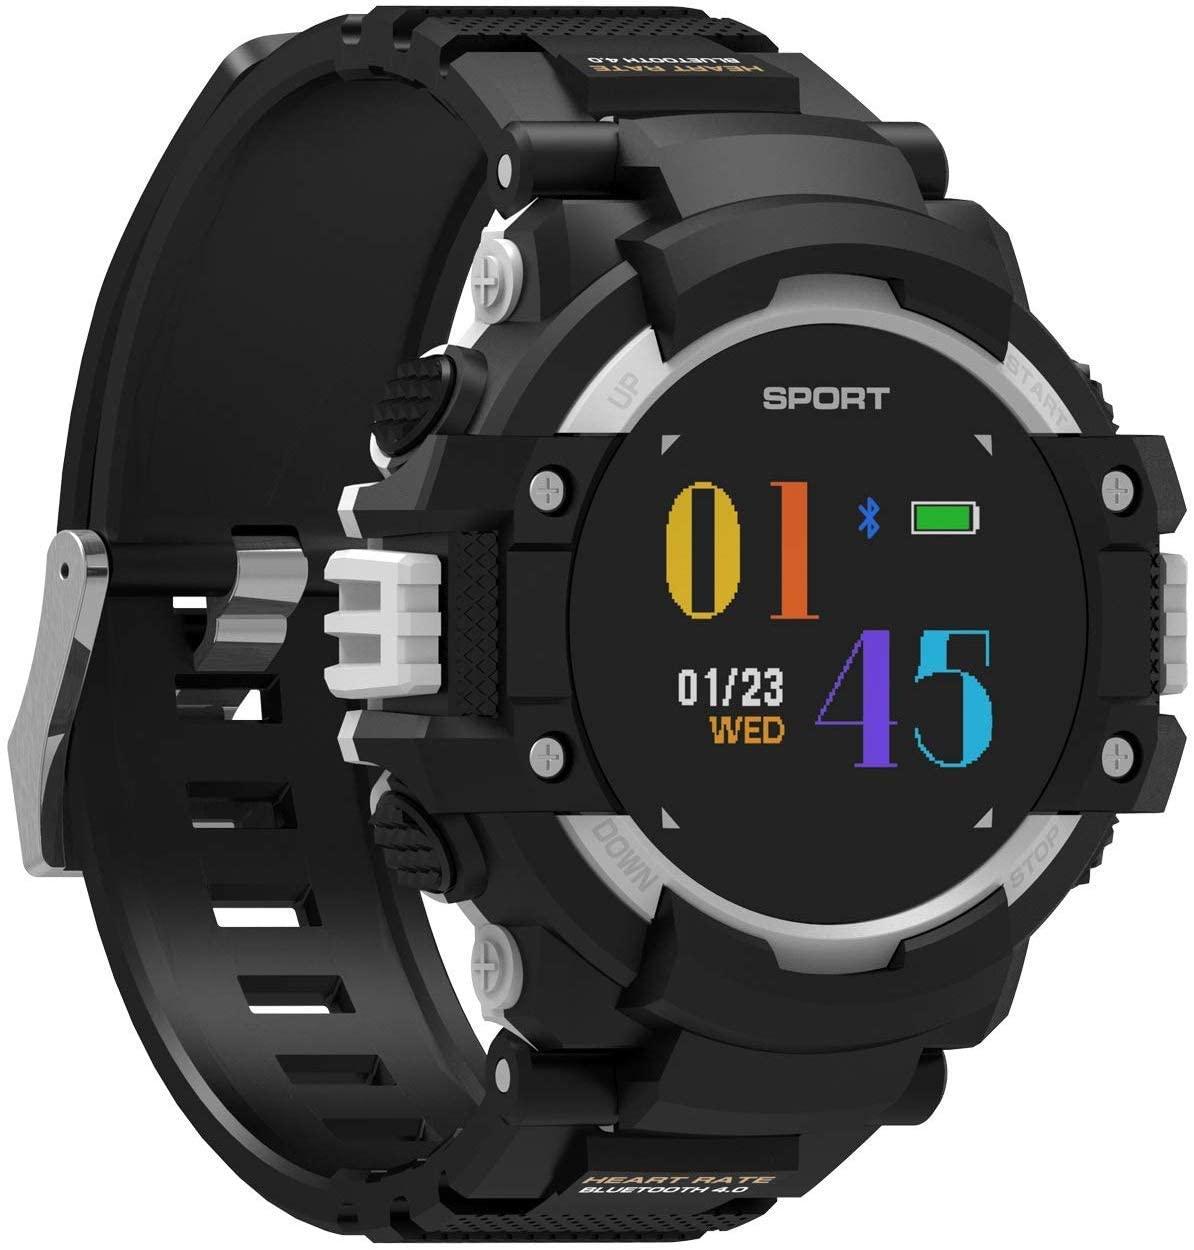 QTQZDD Fitness Tracker, Heart Rate, Temperature, Altitude, Compass, GPS Positioning, IP67 Waterproof Smart Sports Bluetooth Watch